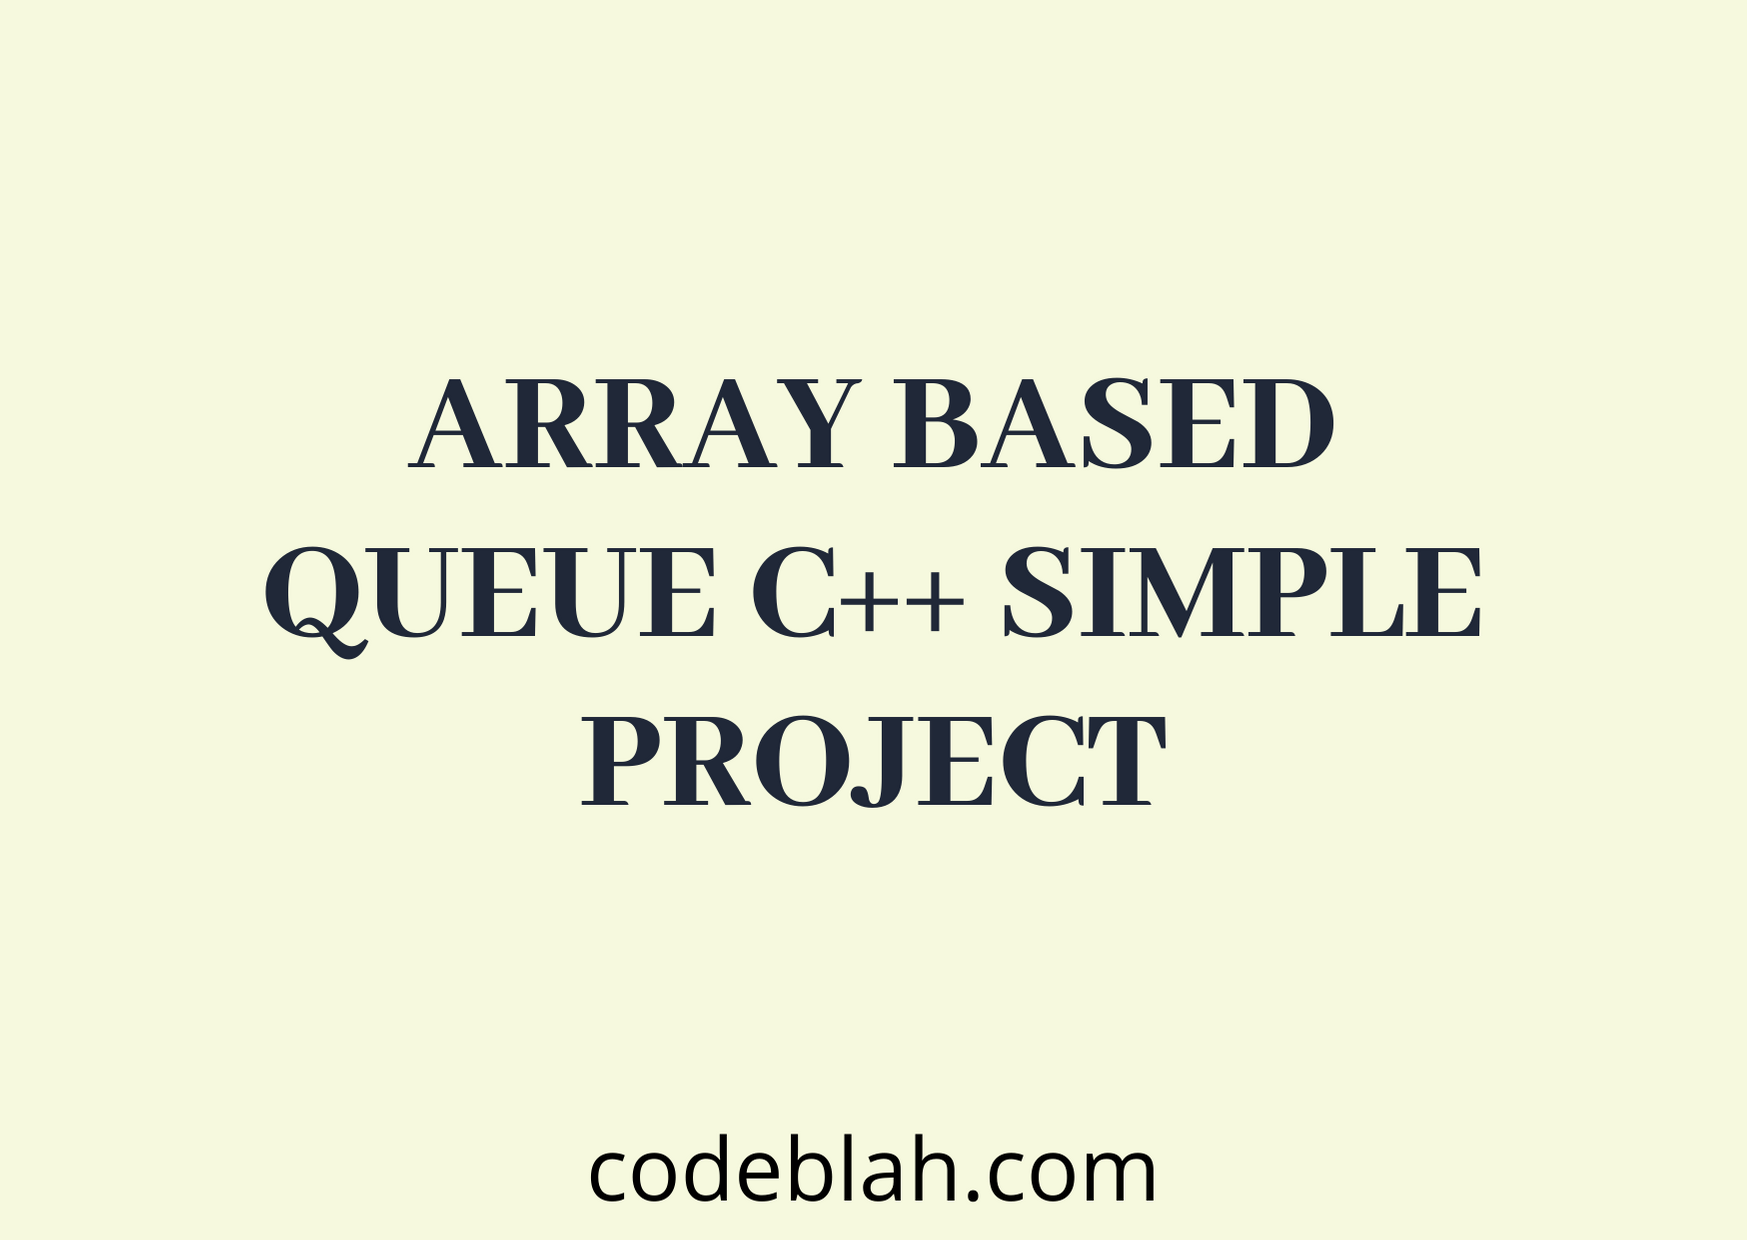 C++ Program to Implement Queue using Array